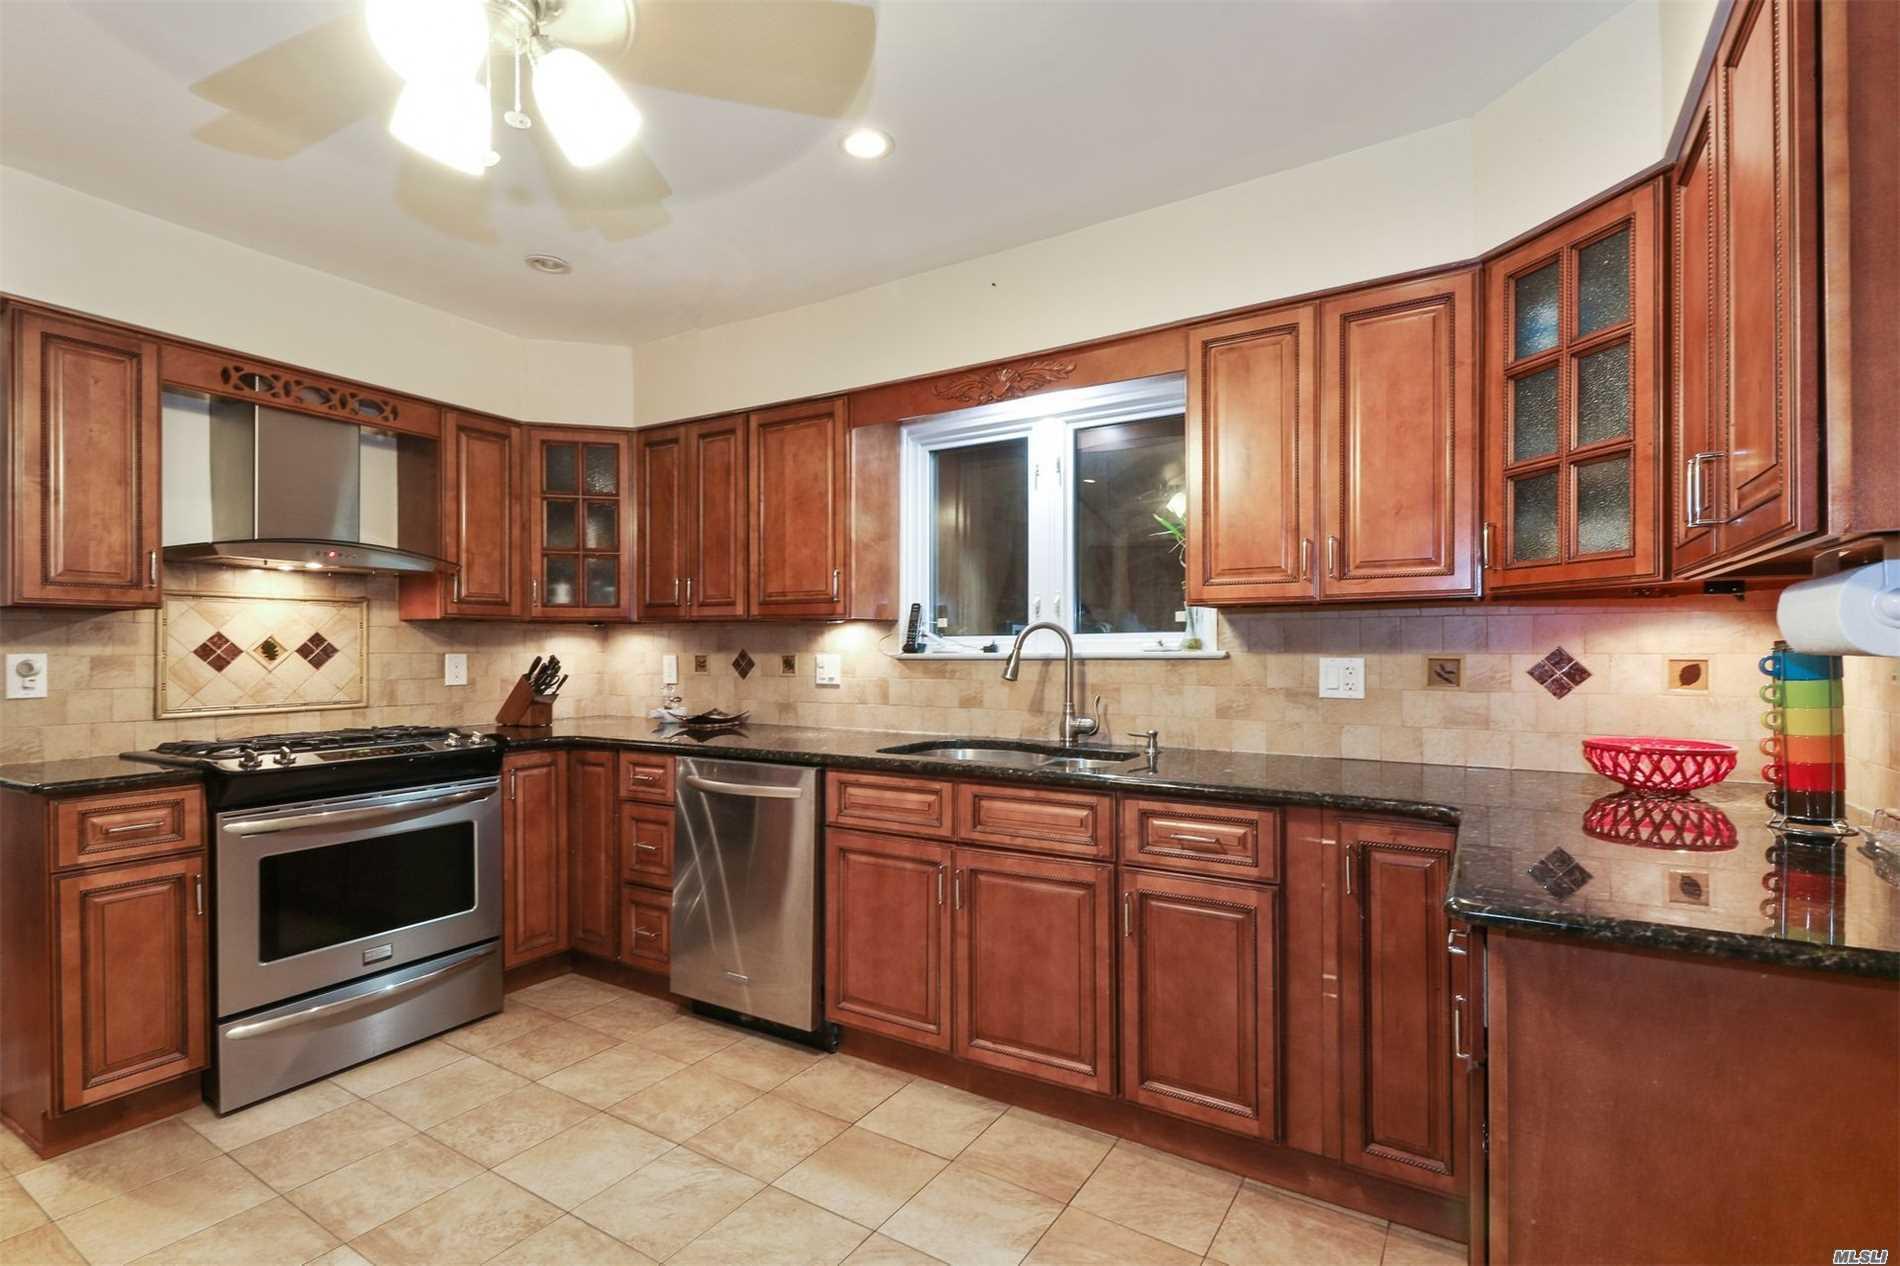 Photo of home for sale at 17 Norwood Ln, Lake Ronkonkoma NY